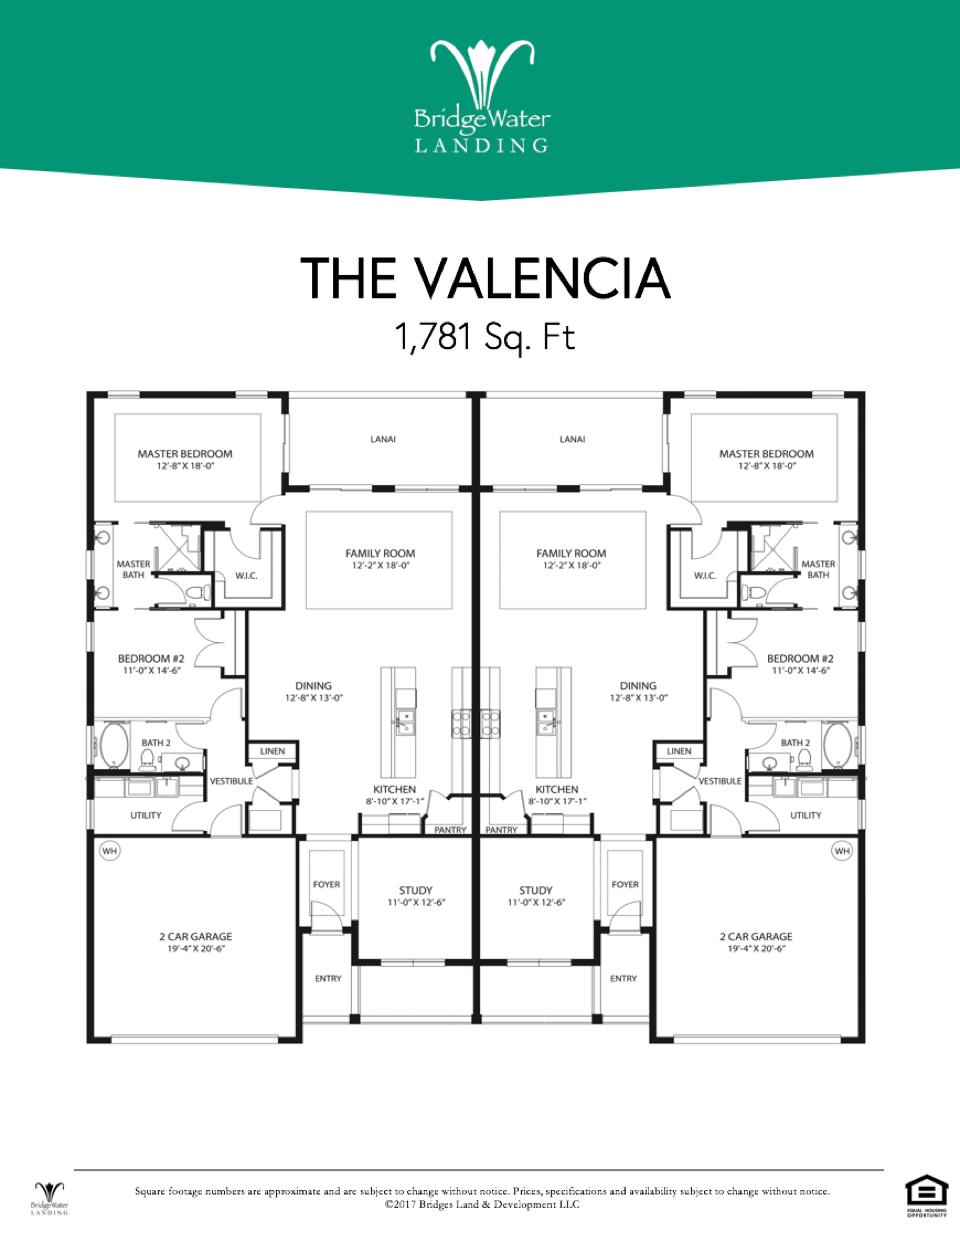 The Valencia